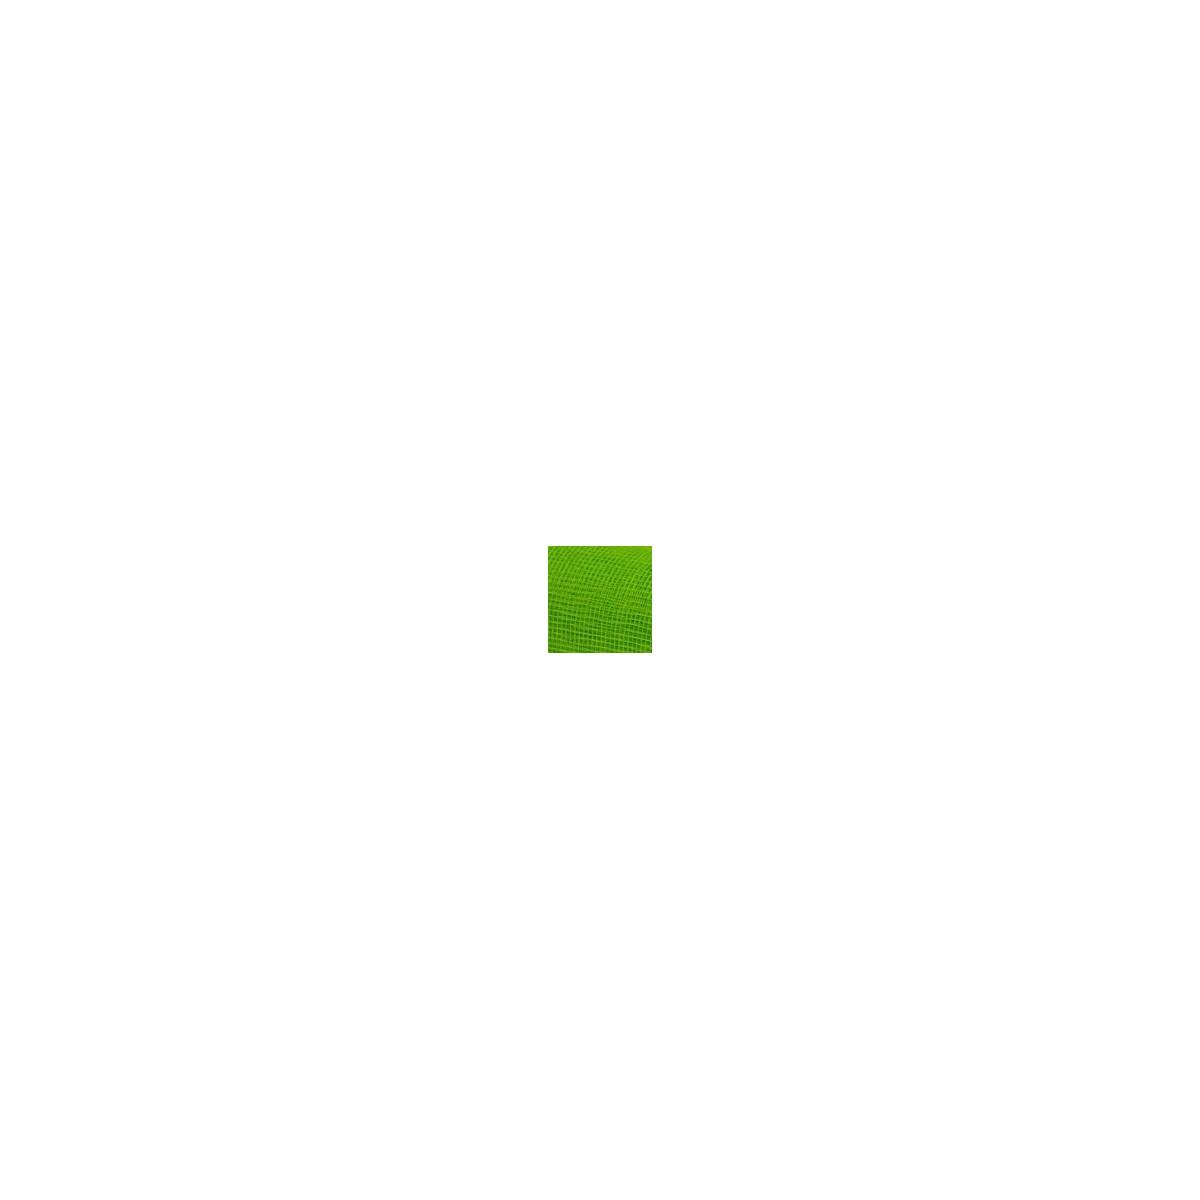 Deconet Telo Retina Cm.54x9,2 Mt. Verde Prato